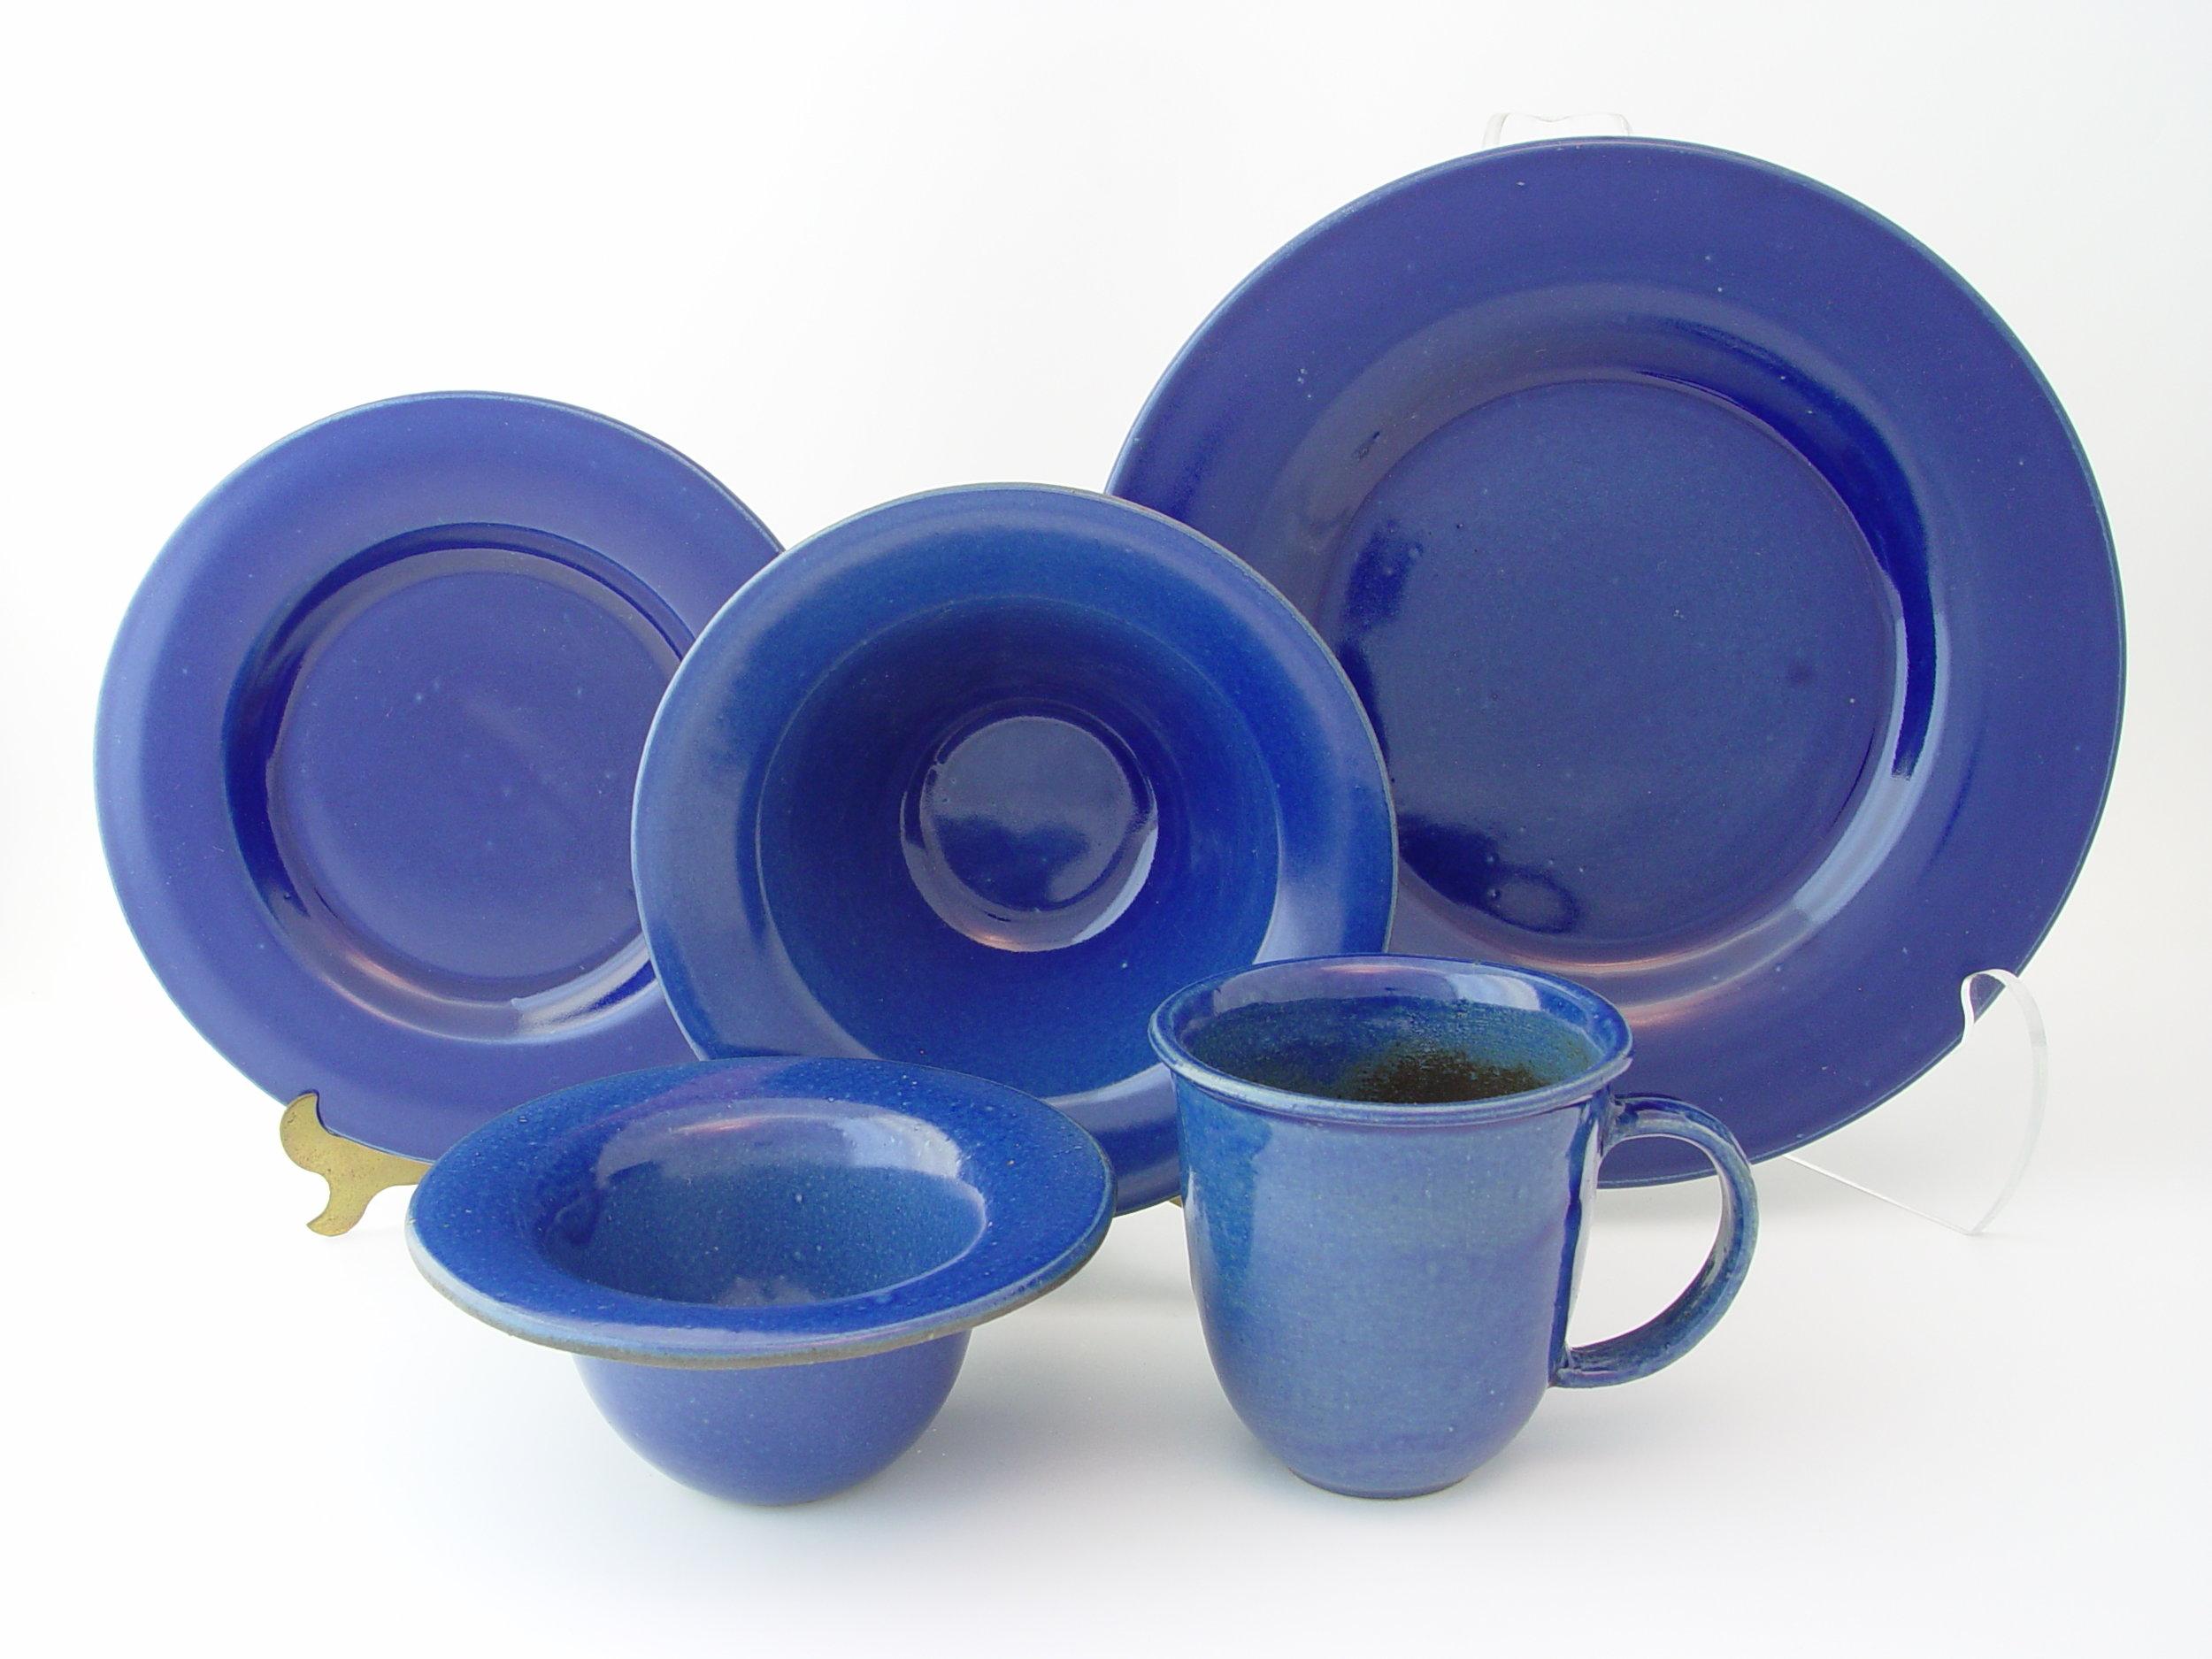 Bright Blue Dinnerware.JPG